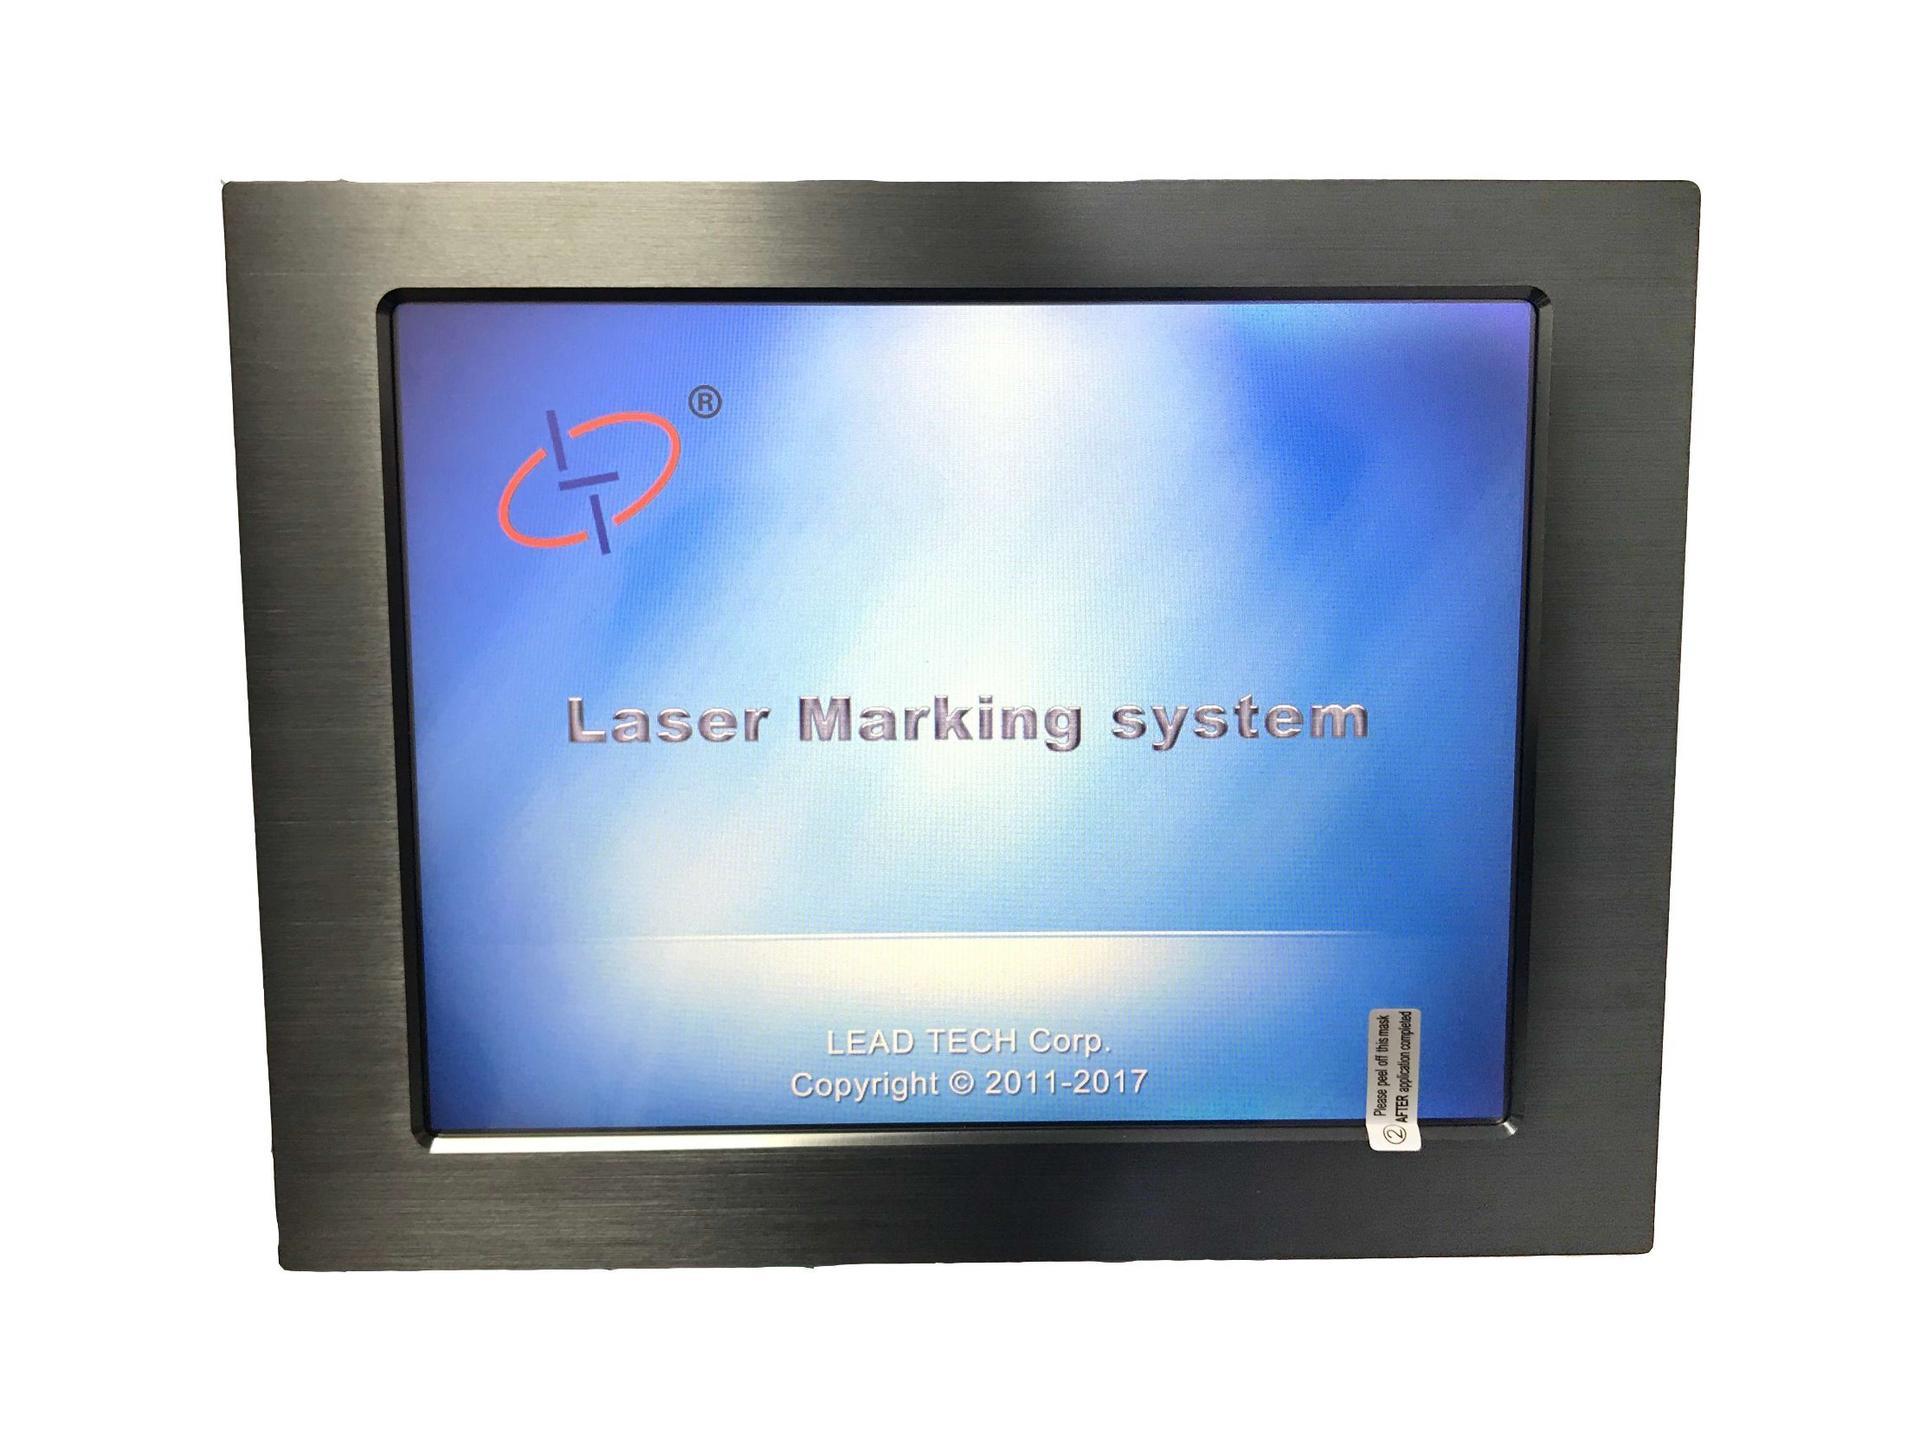 Lead Tech Lt8020c/Lt8030c CO2 20W/30W High Precision Efficient Lasermarking Machine for PPR/PE/PVC Pipe Marking